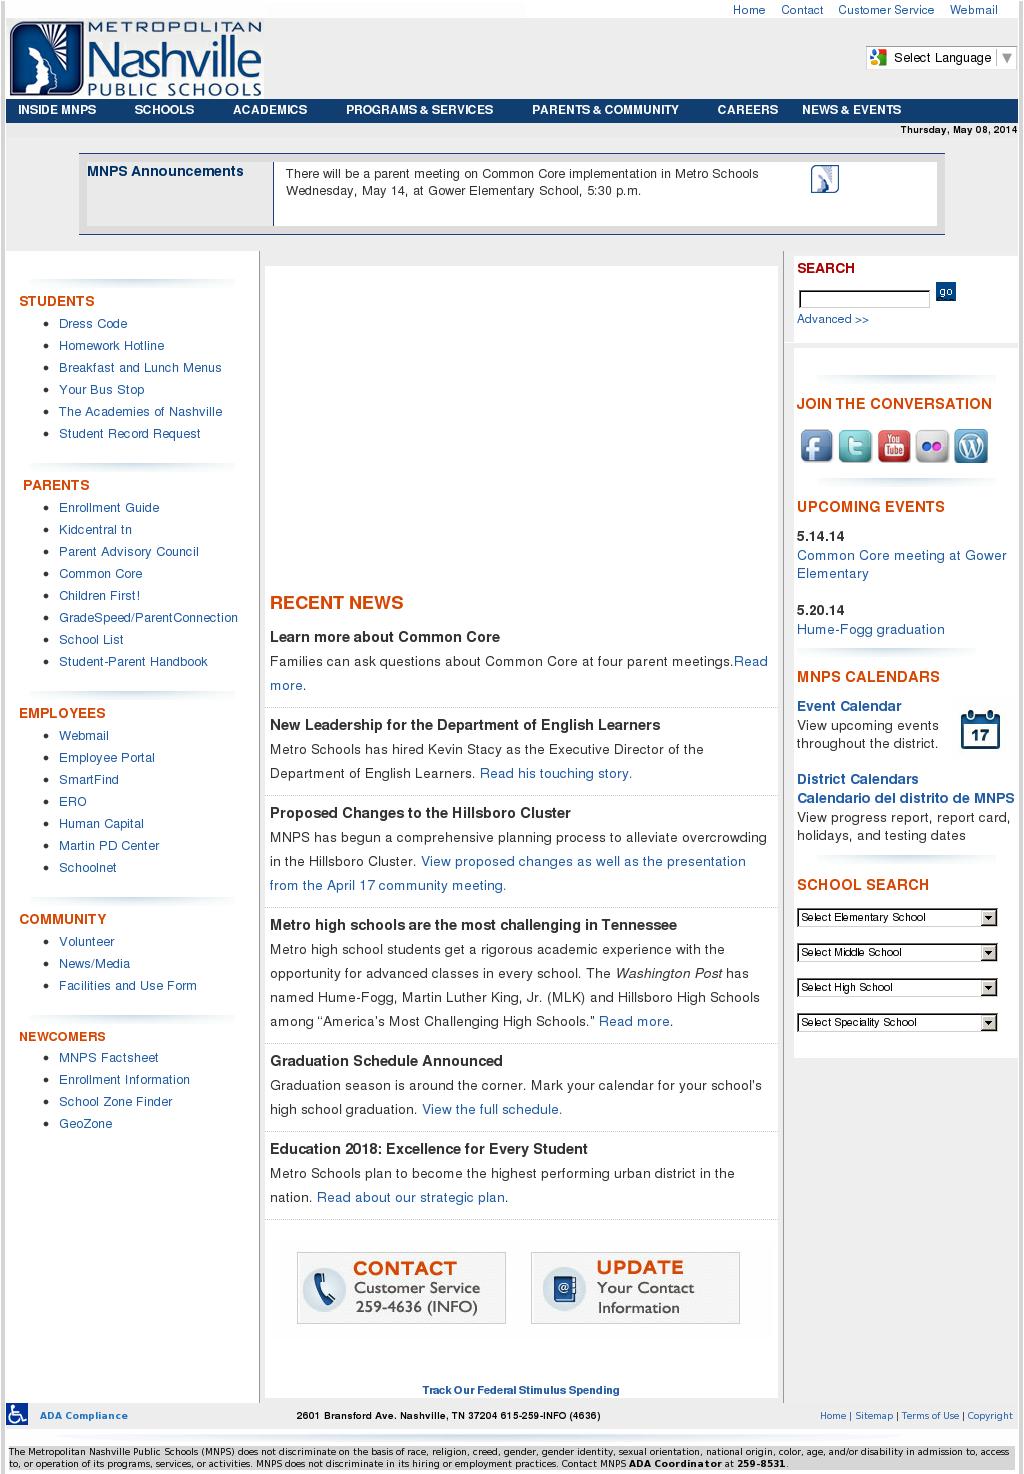 Mnps Calendar 2020.Mnps Competitors Revenue And Employees Owler Company Profile